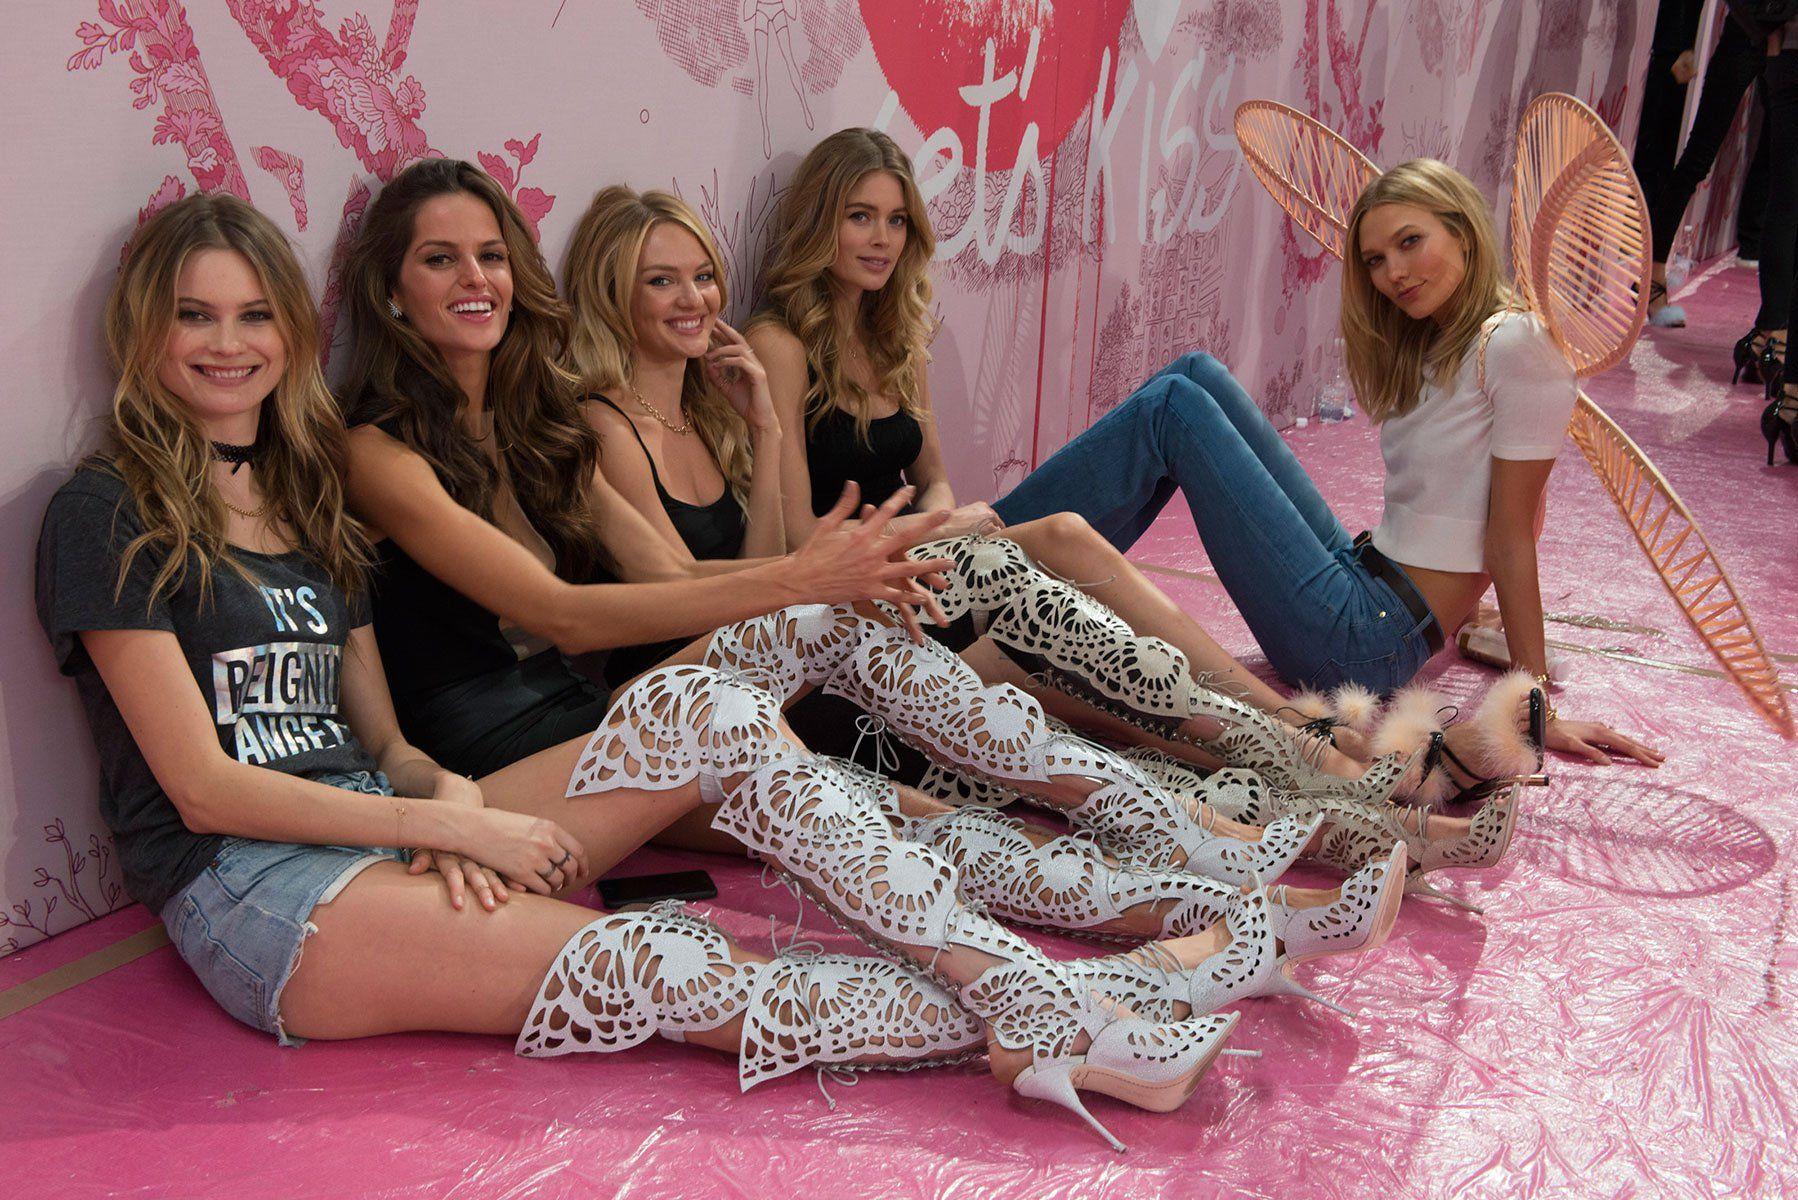 From left: Behati Prinsloo, Izabel Goulart, Candice Swanepoel, Doutzen Kroes, Karlie Kloss